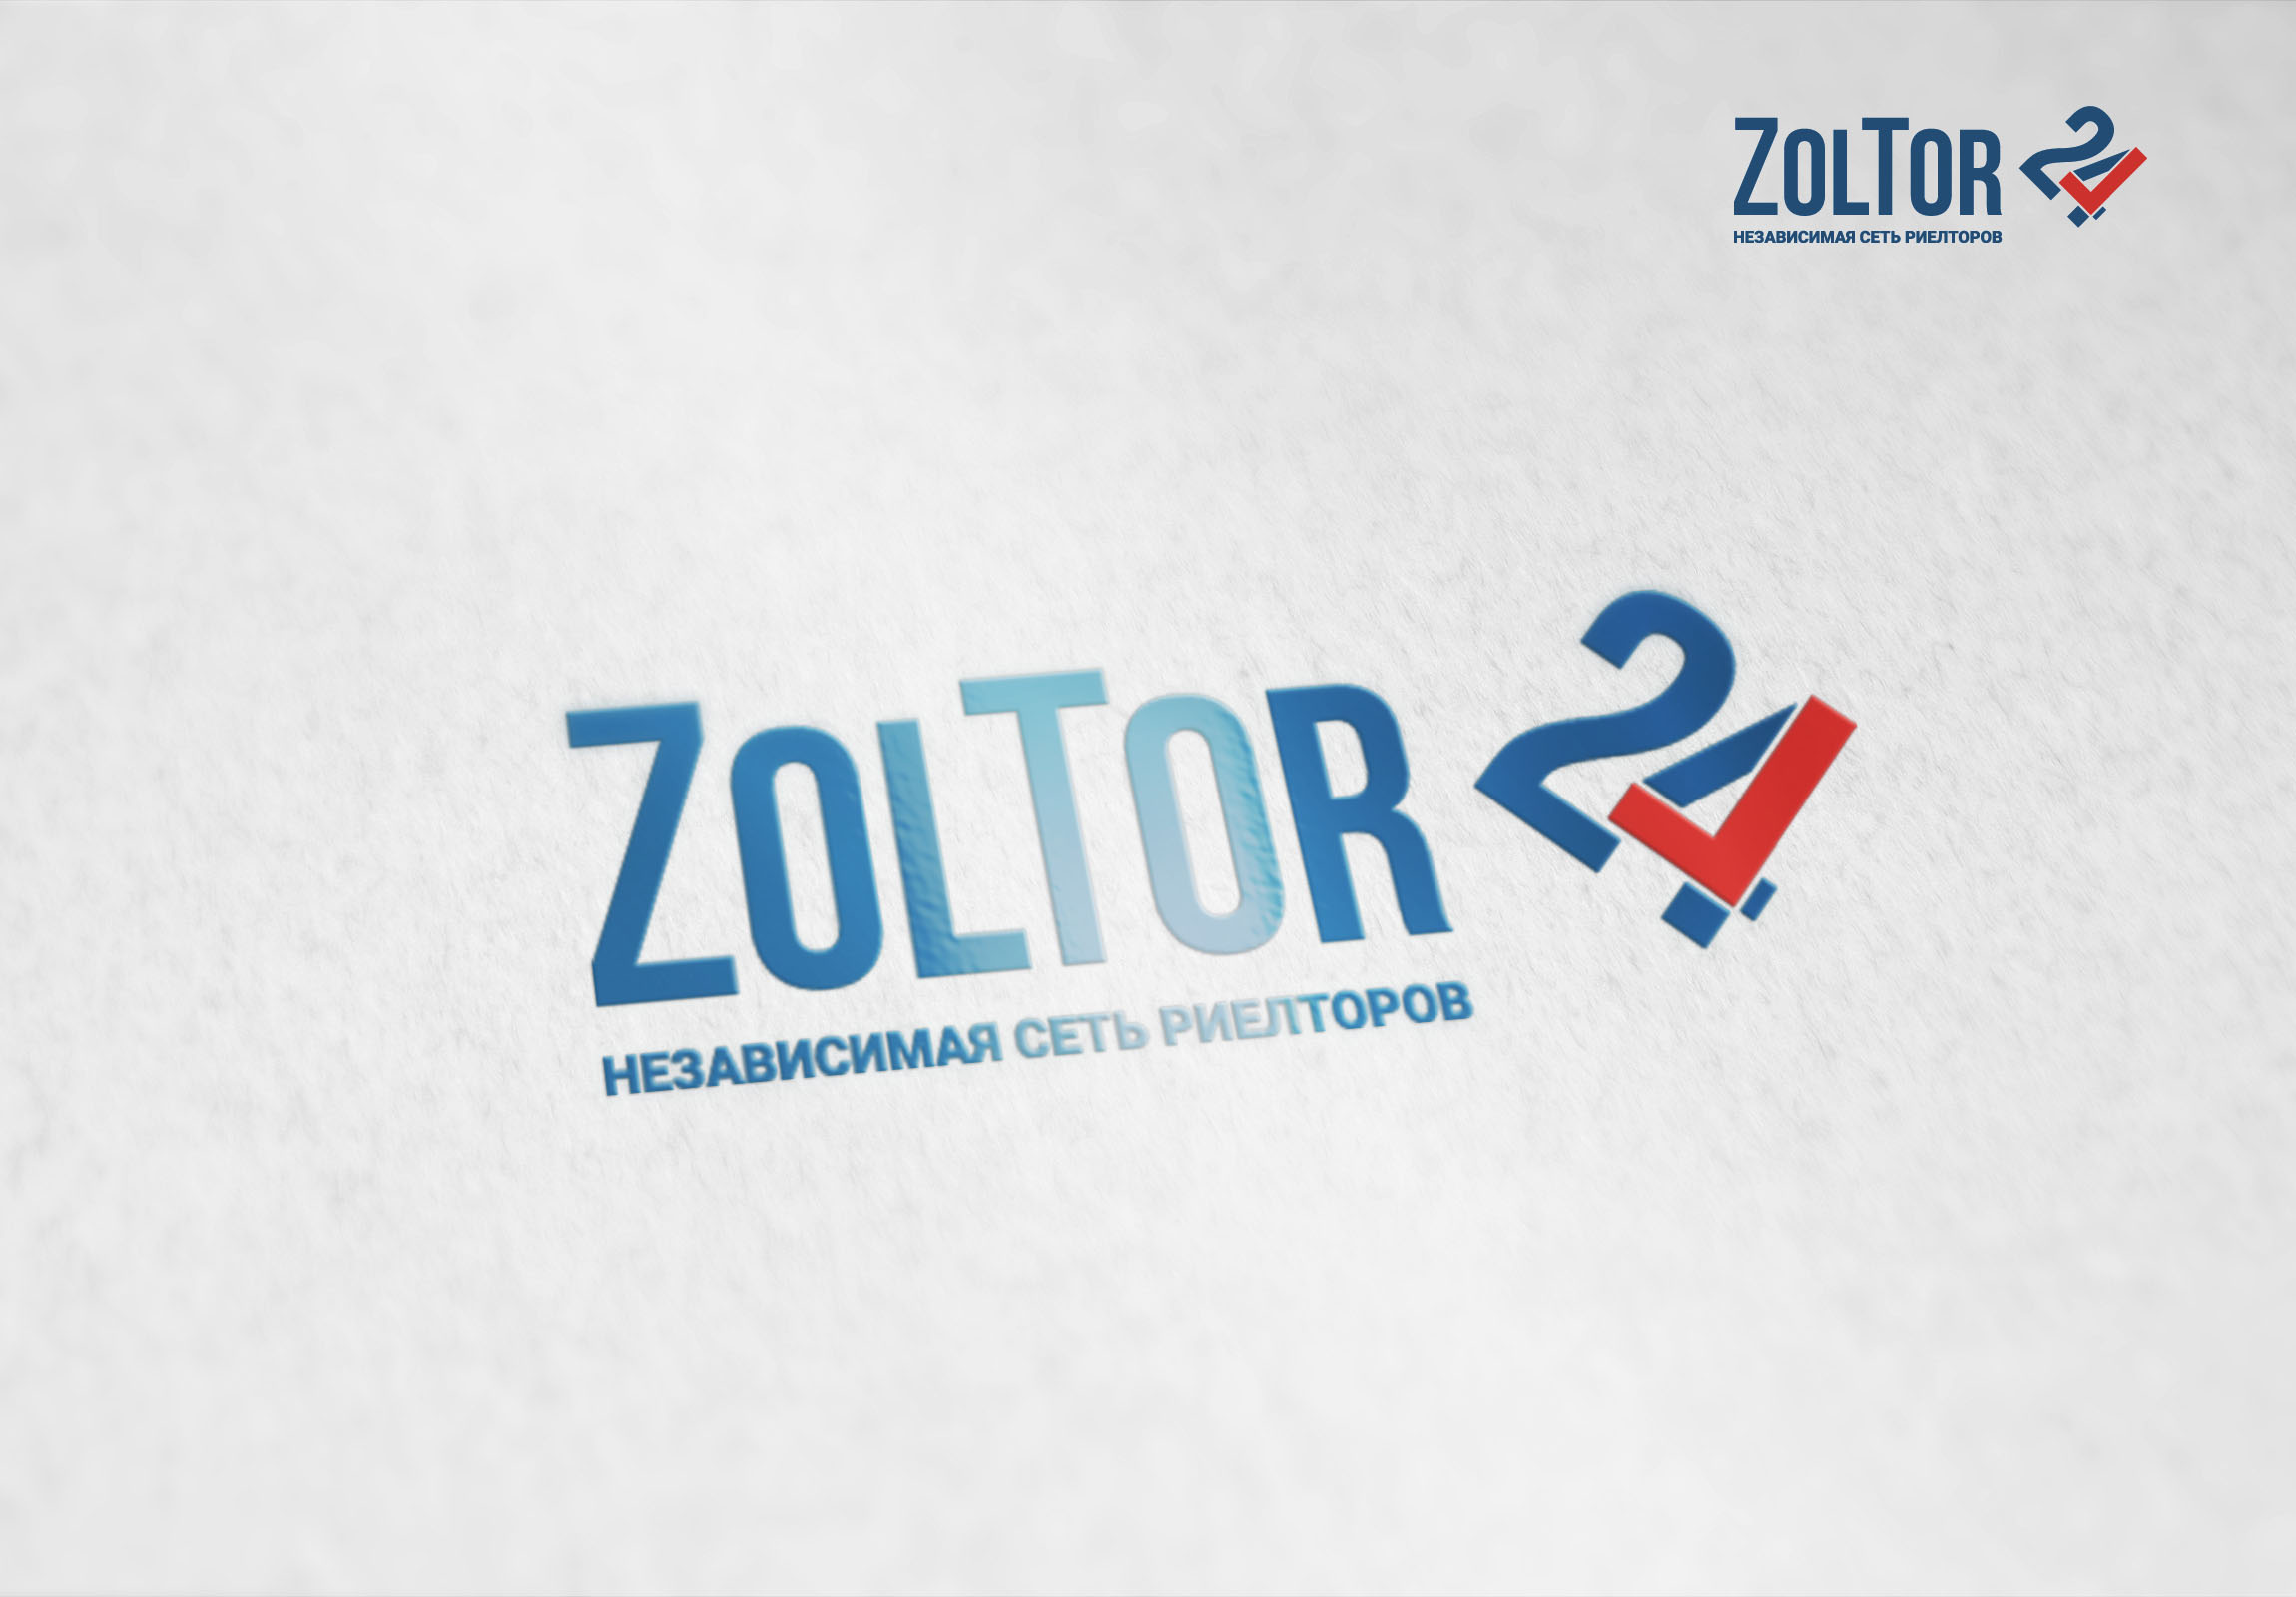 Логотип и фирменный стиль ZolTor24 фото f_6785c8a184065d87.jpg